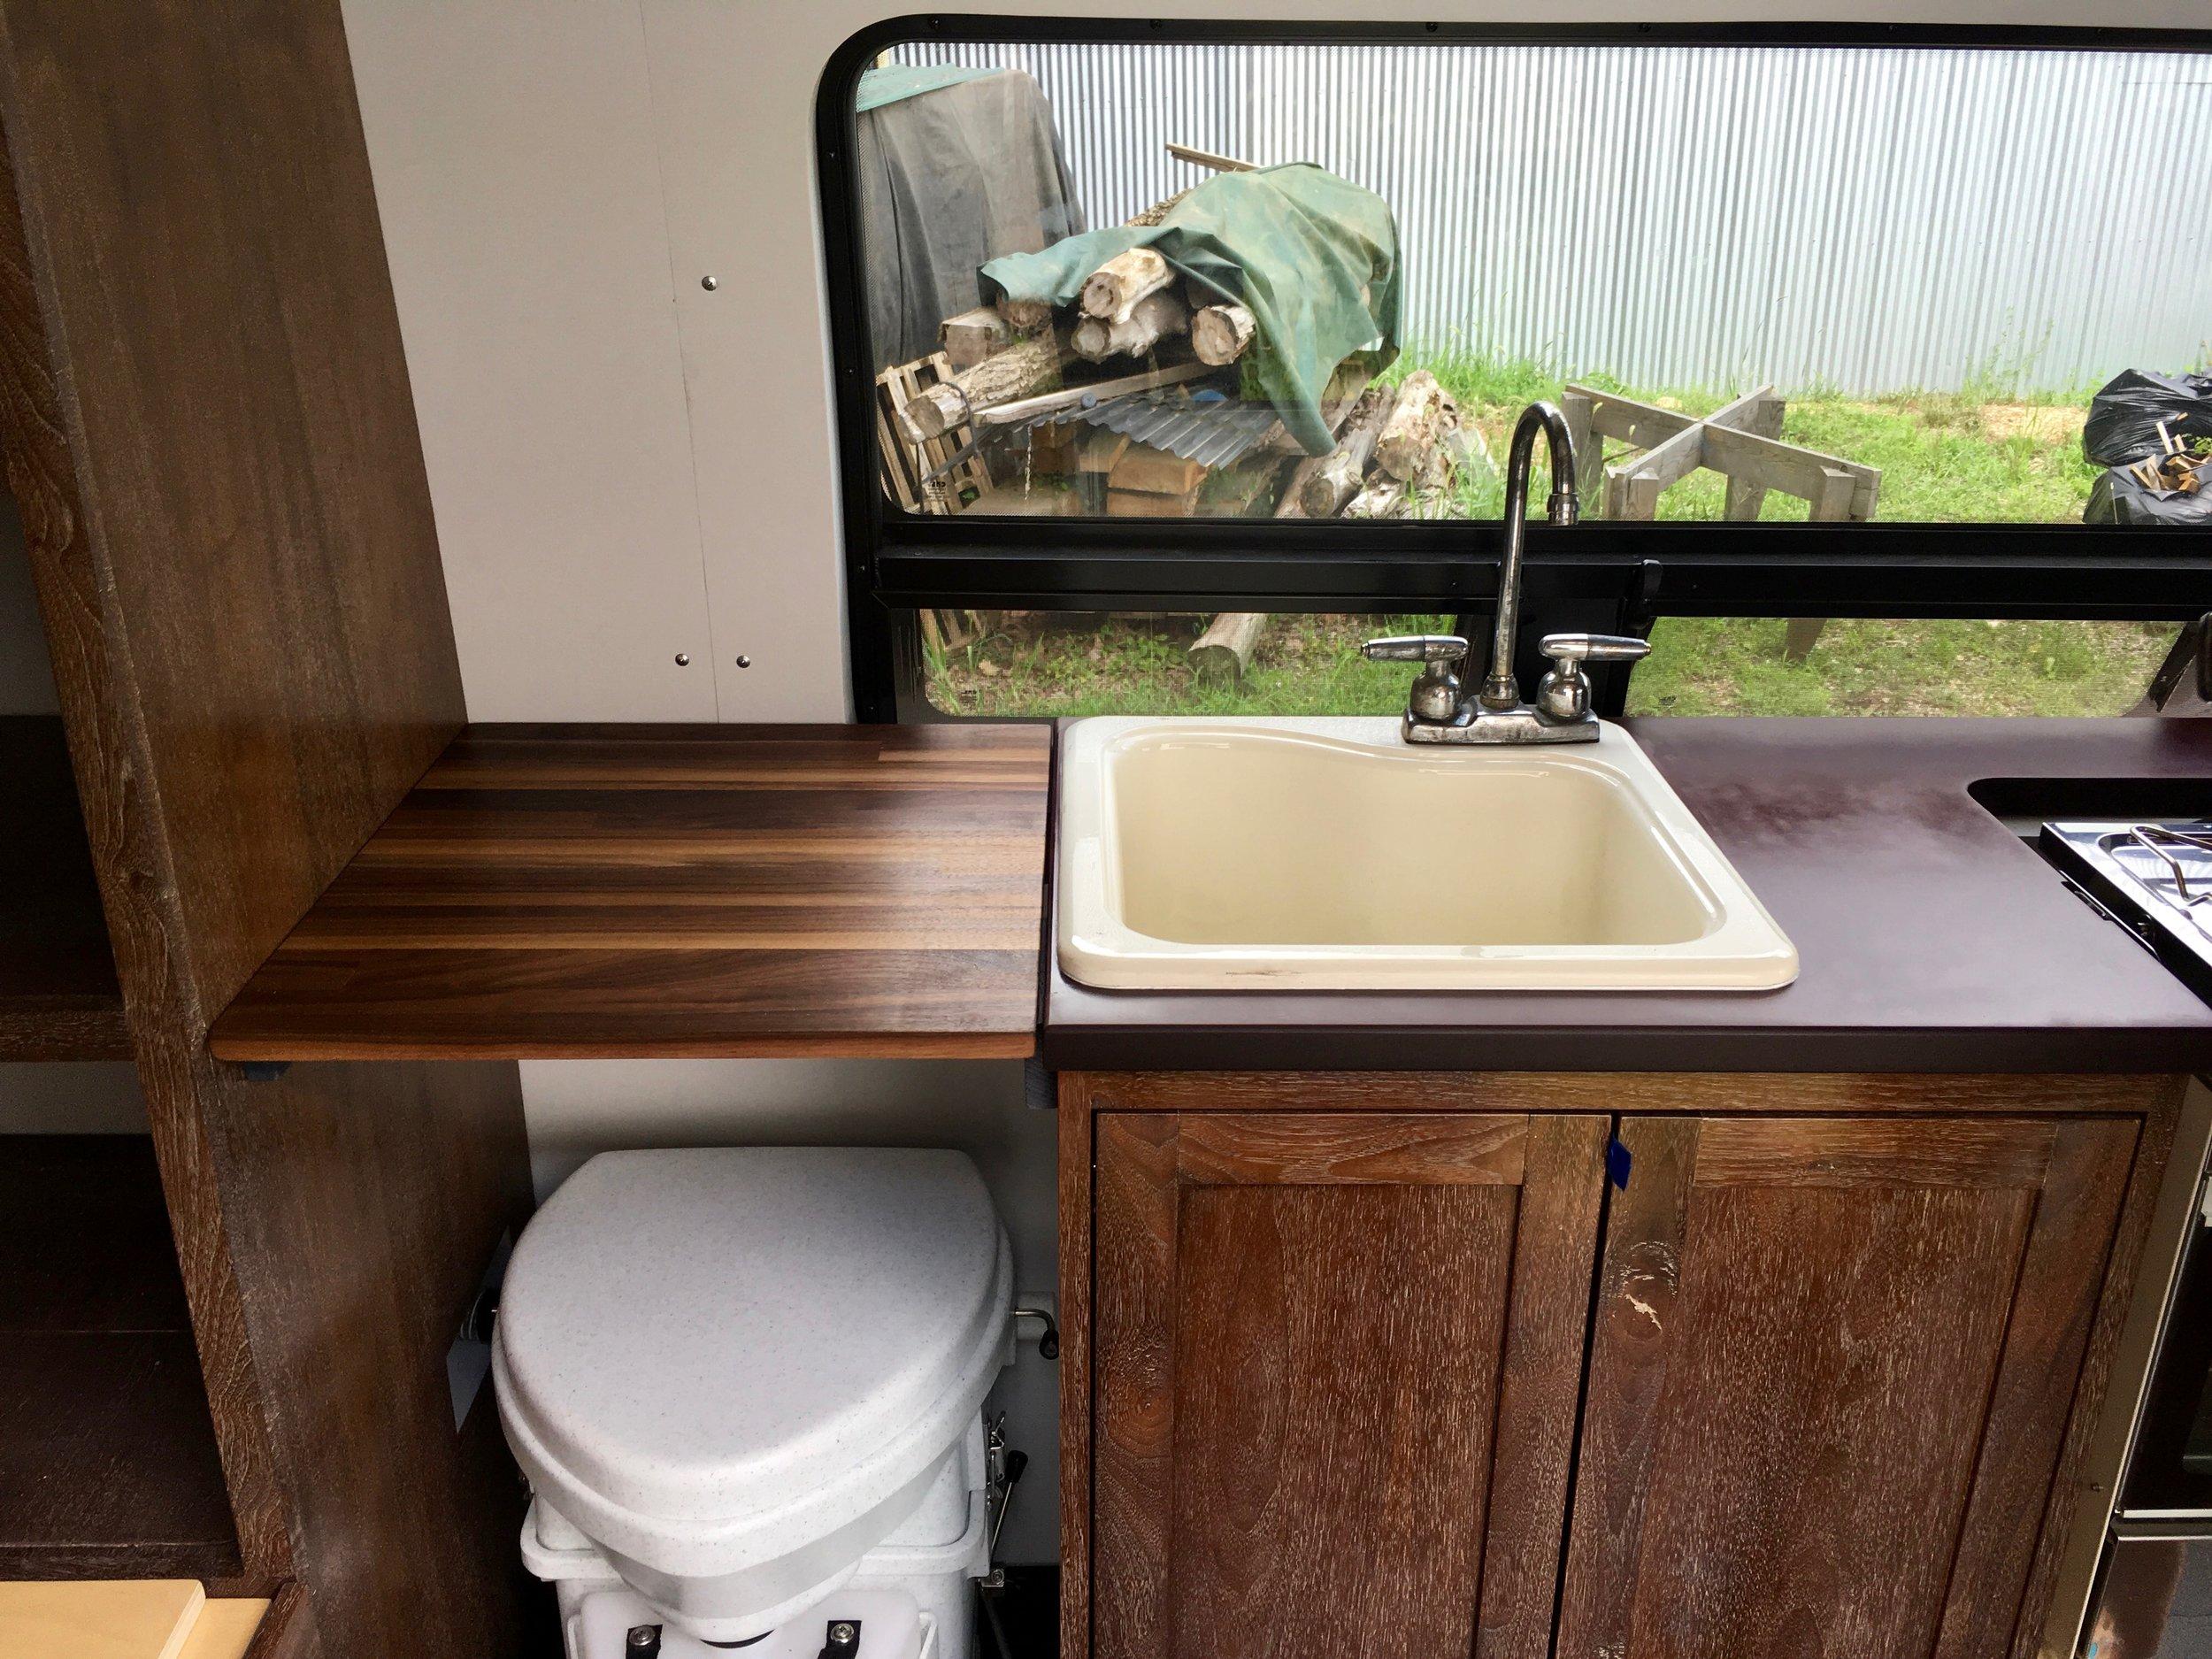 Super secret toilet under the cutting board